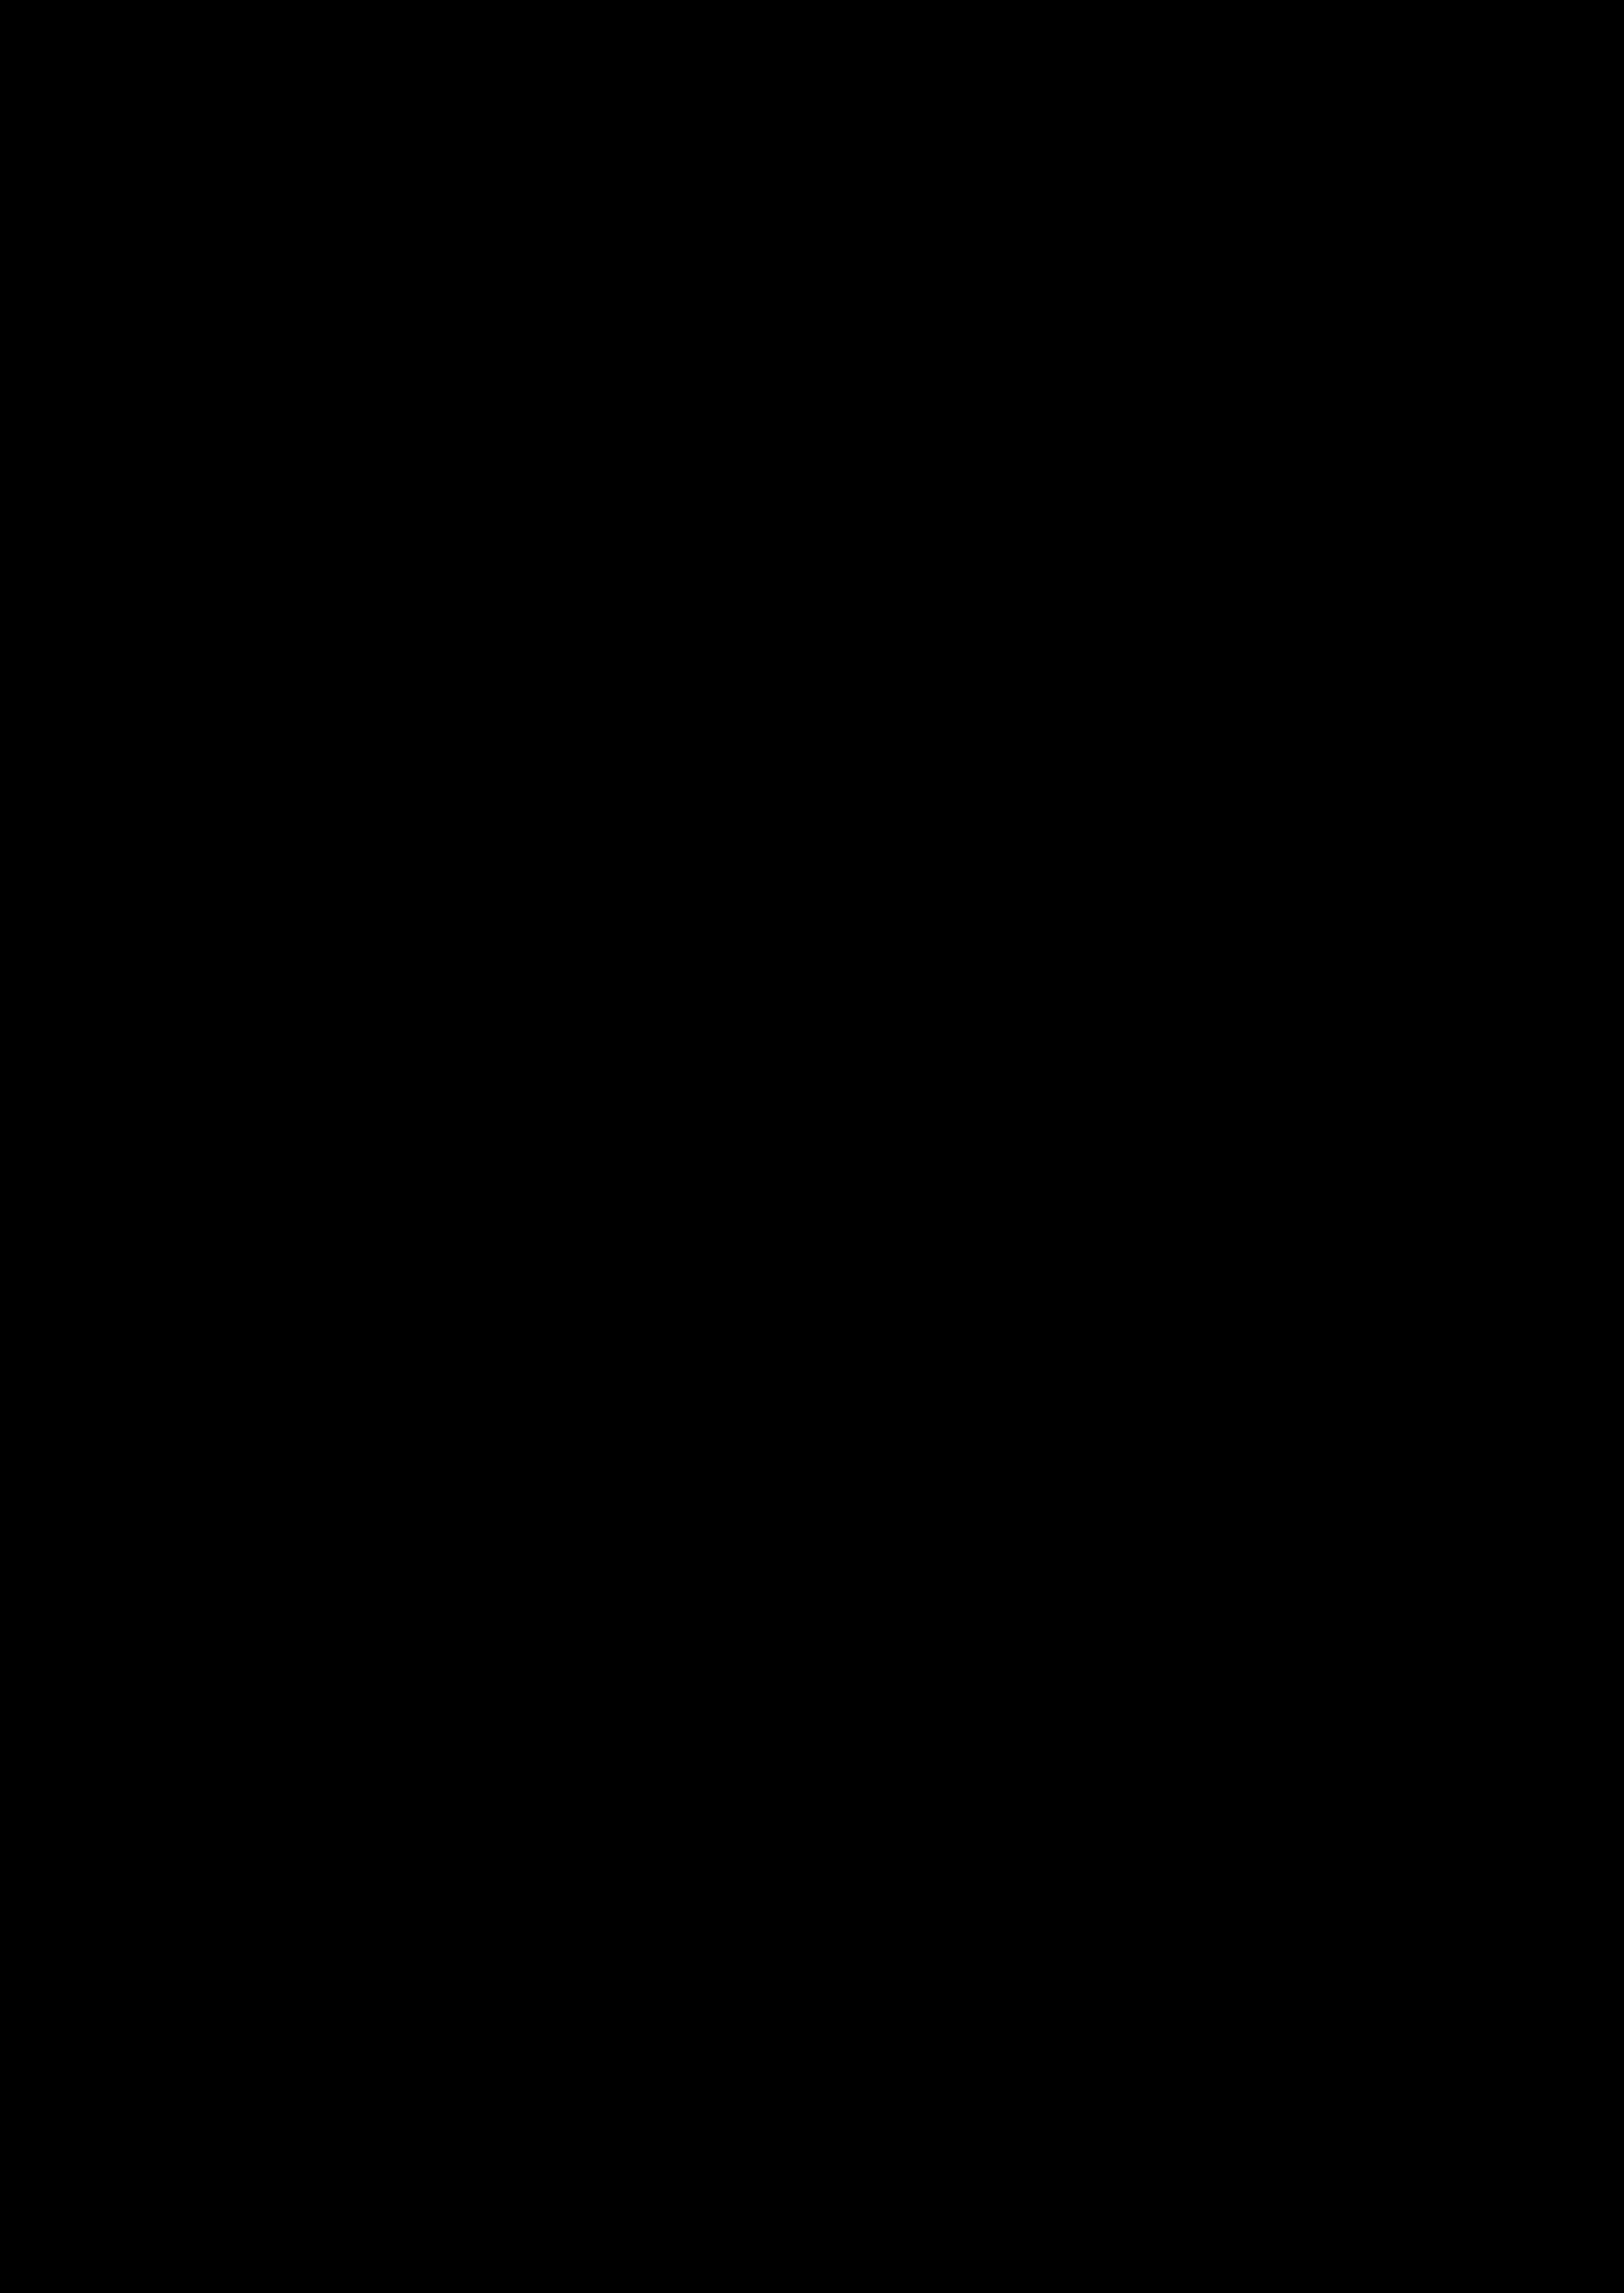 Satyr Vector Clipart image.